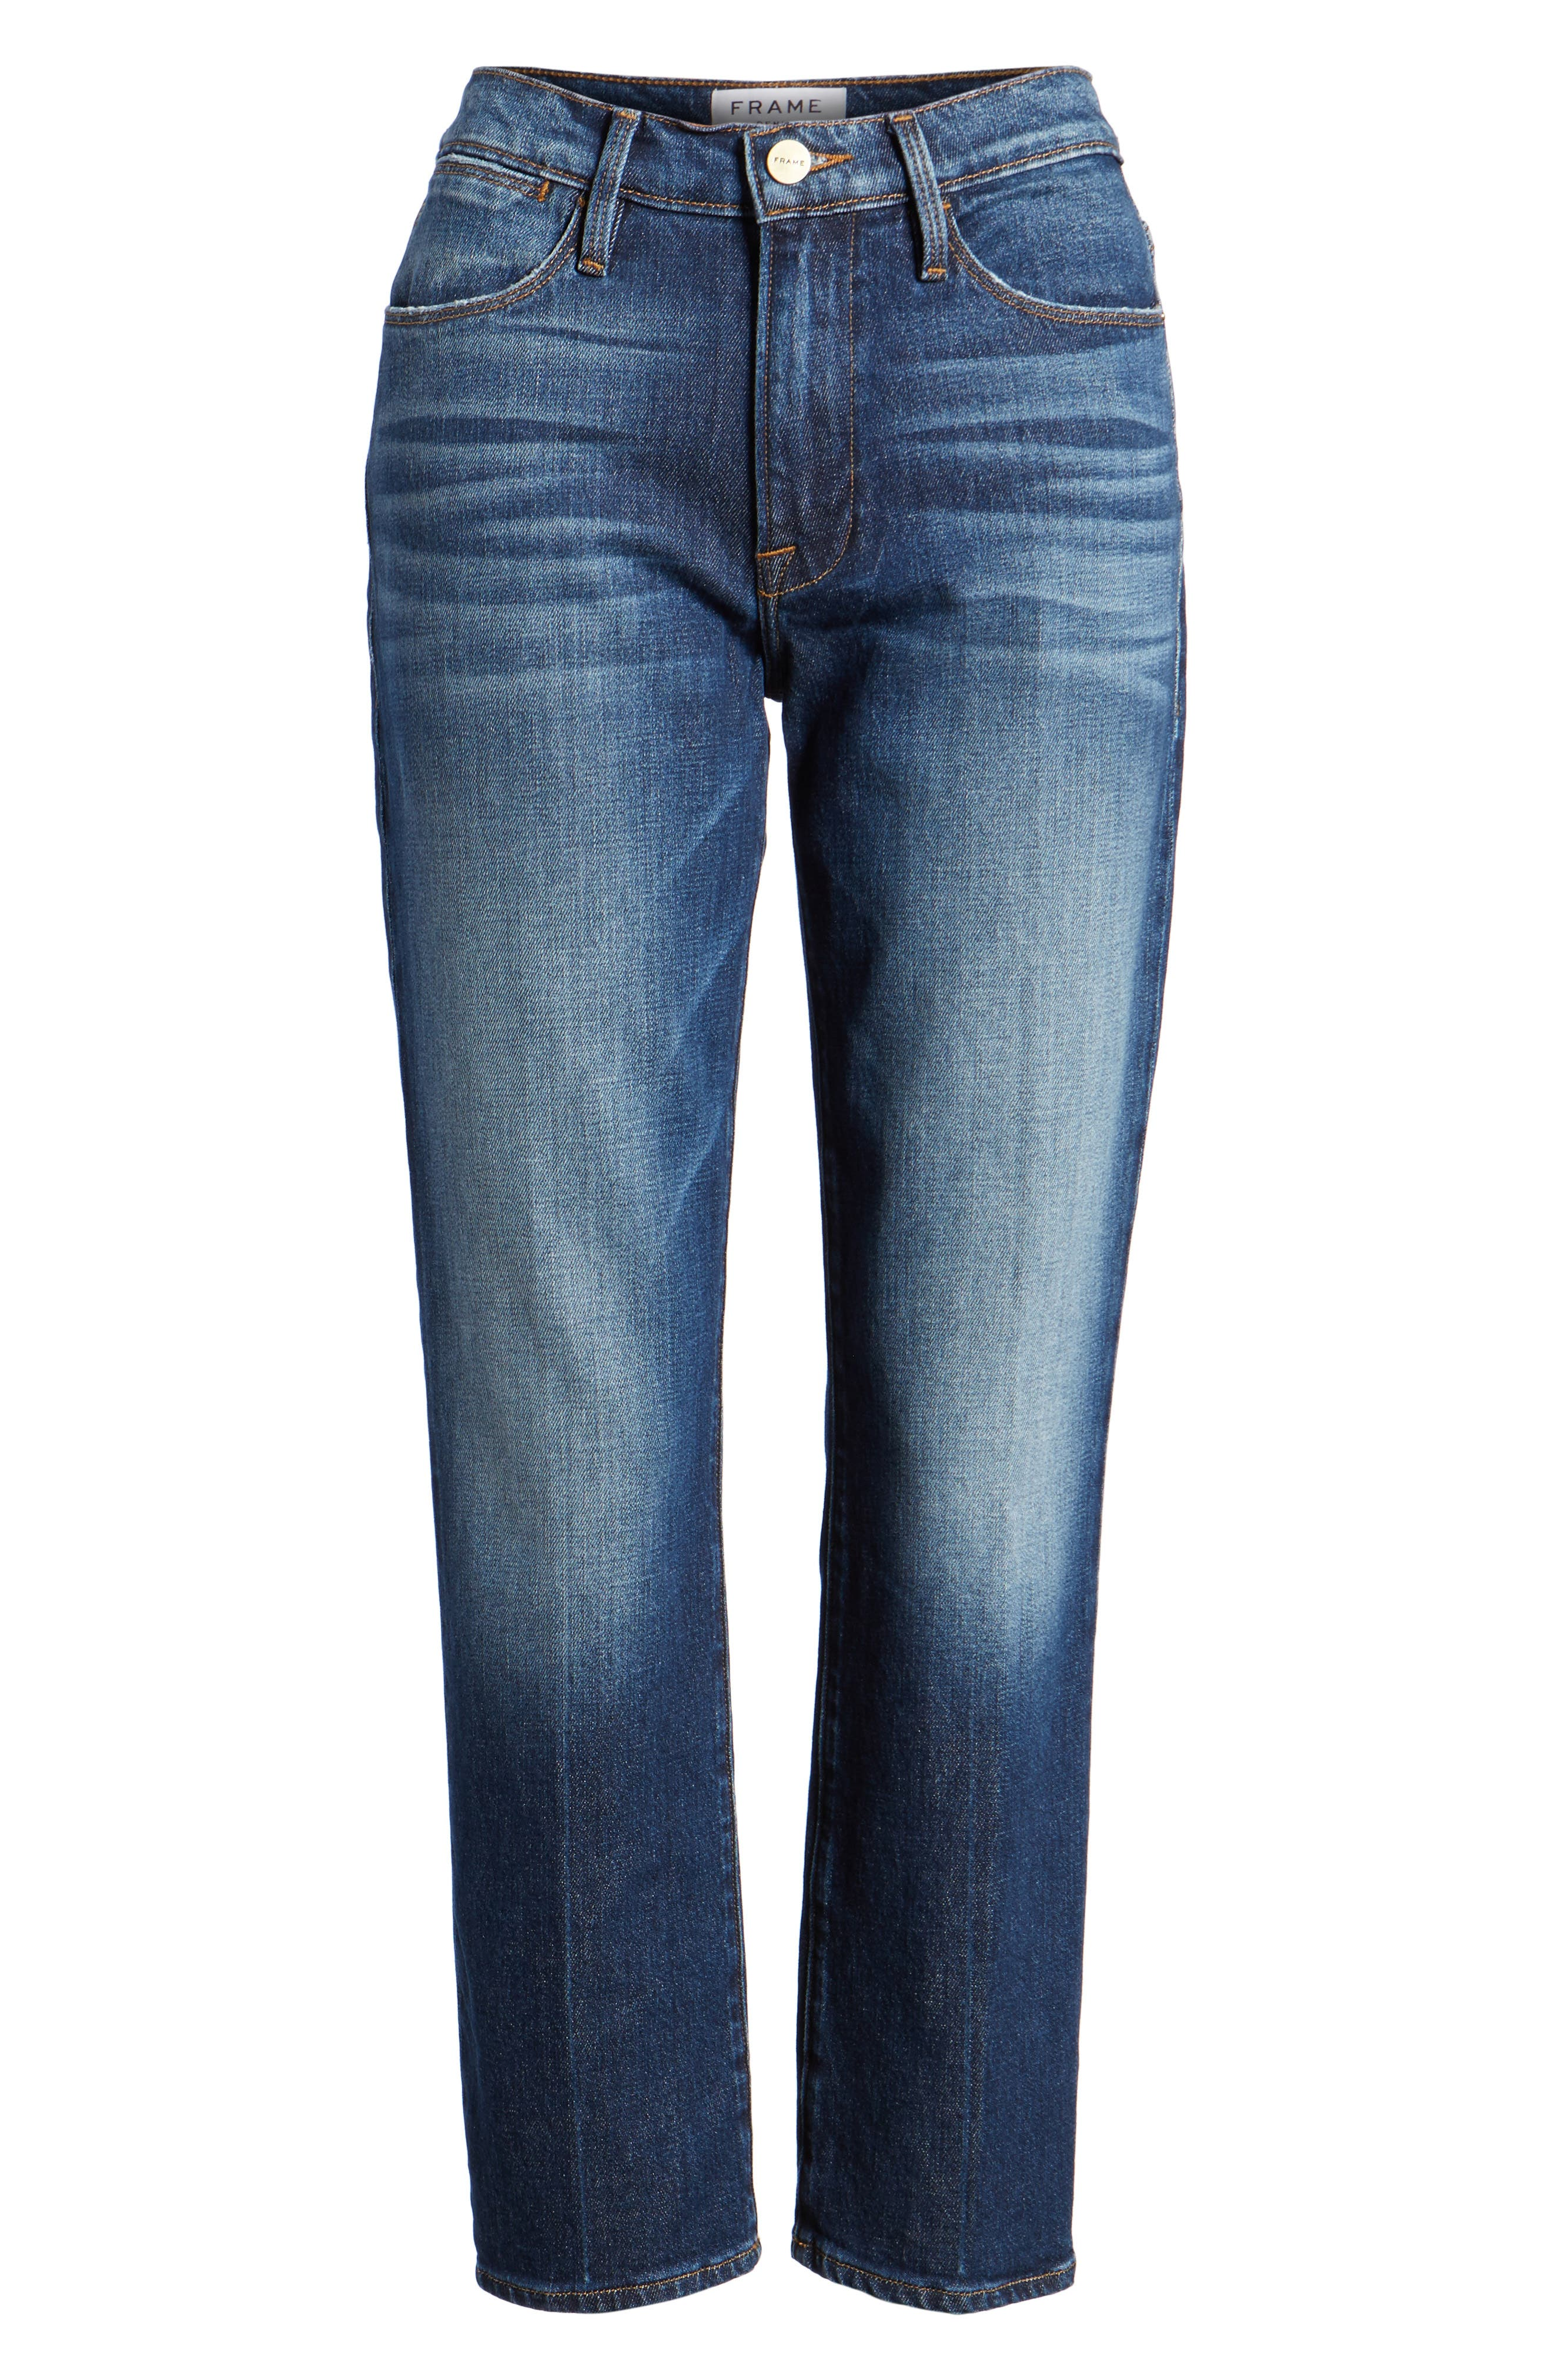 Le High Straight Leg Jeans,                             Alternate thumbnail 7, color,                             401